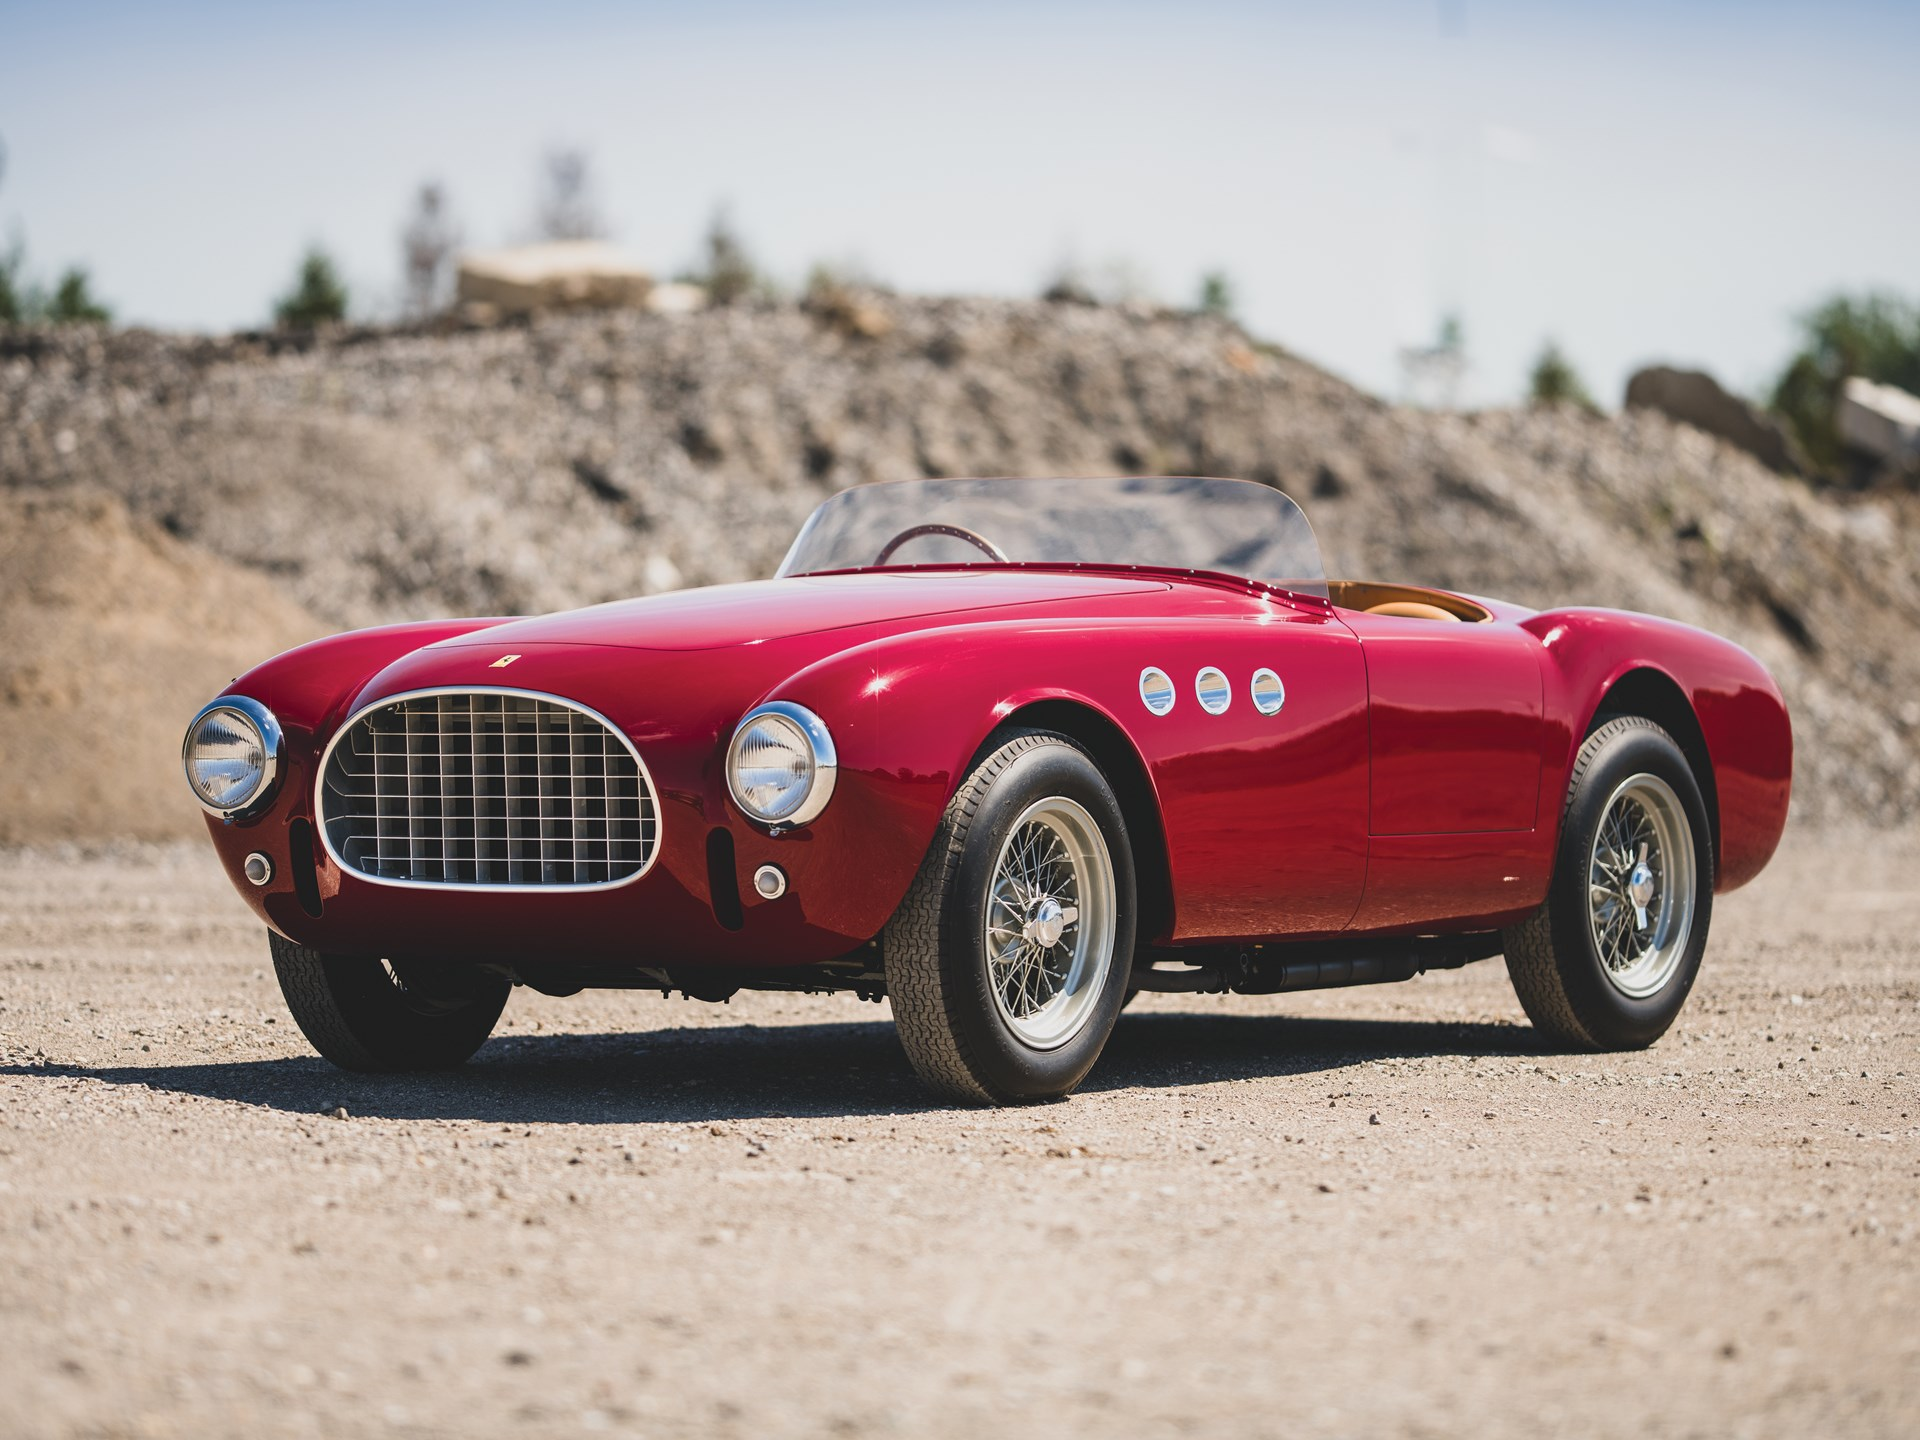 1952 Ferrari 225 Sport Spider by Vignale